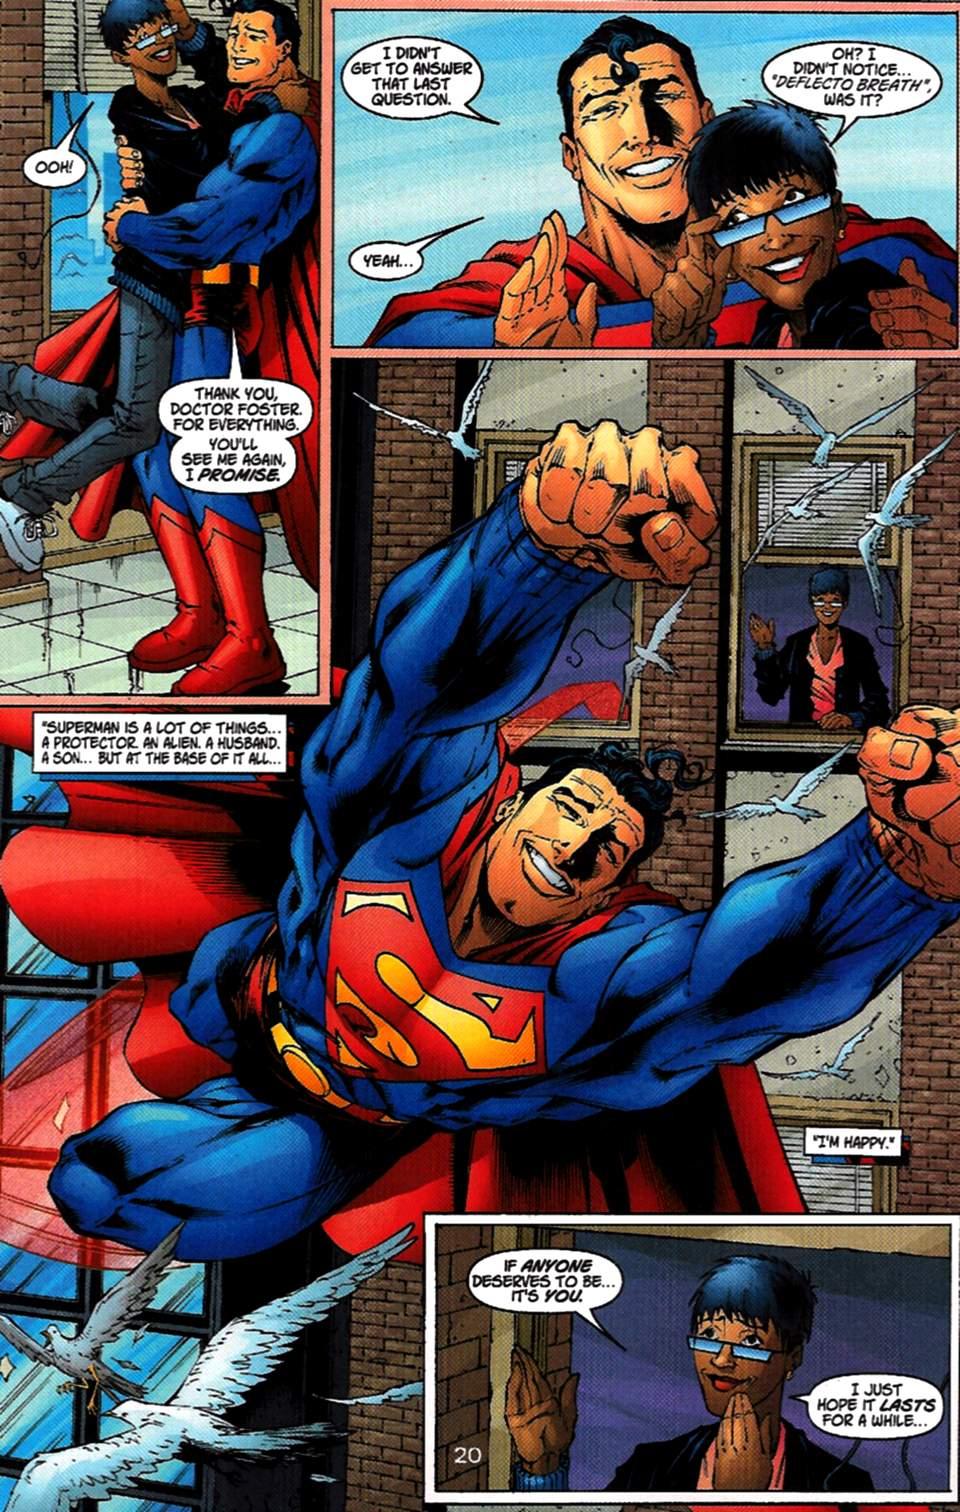 Action Comics (1938) 797 Page 20